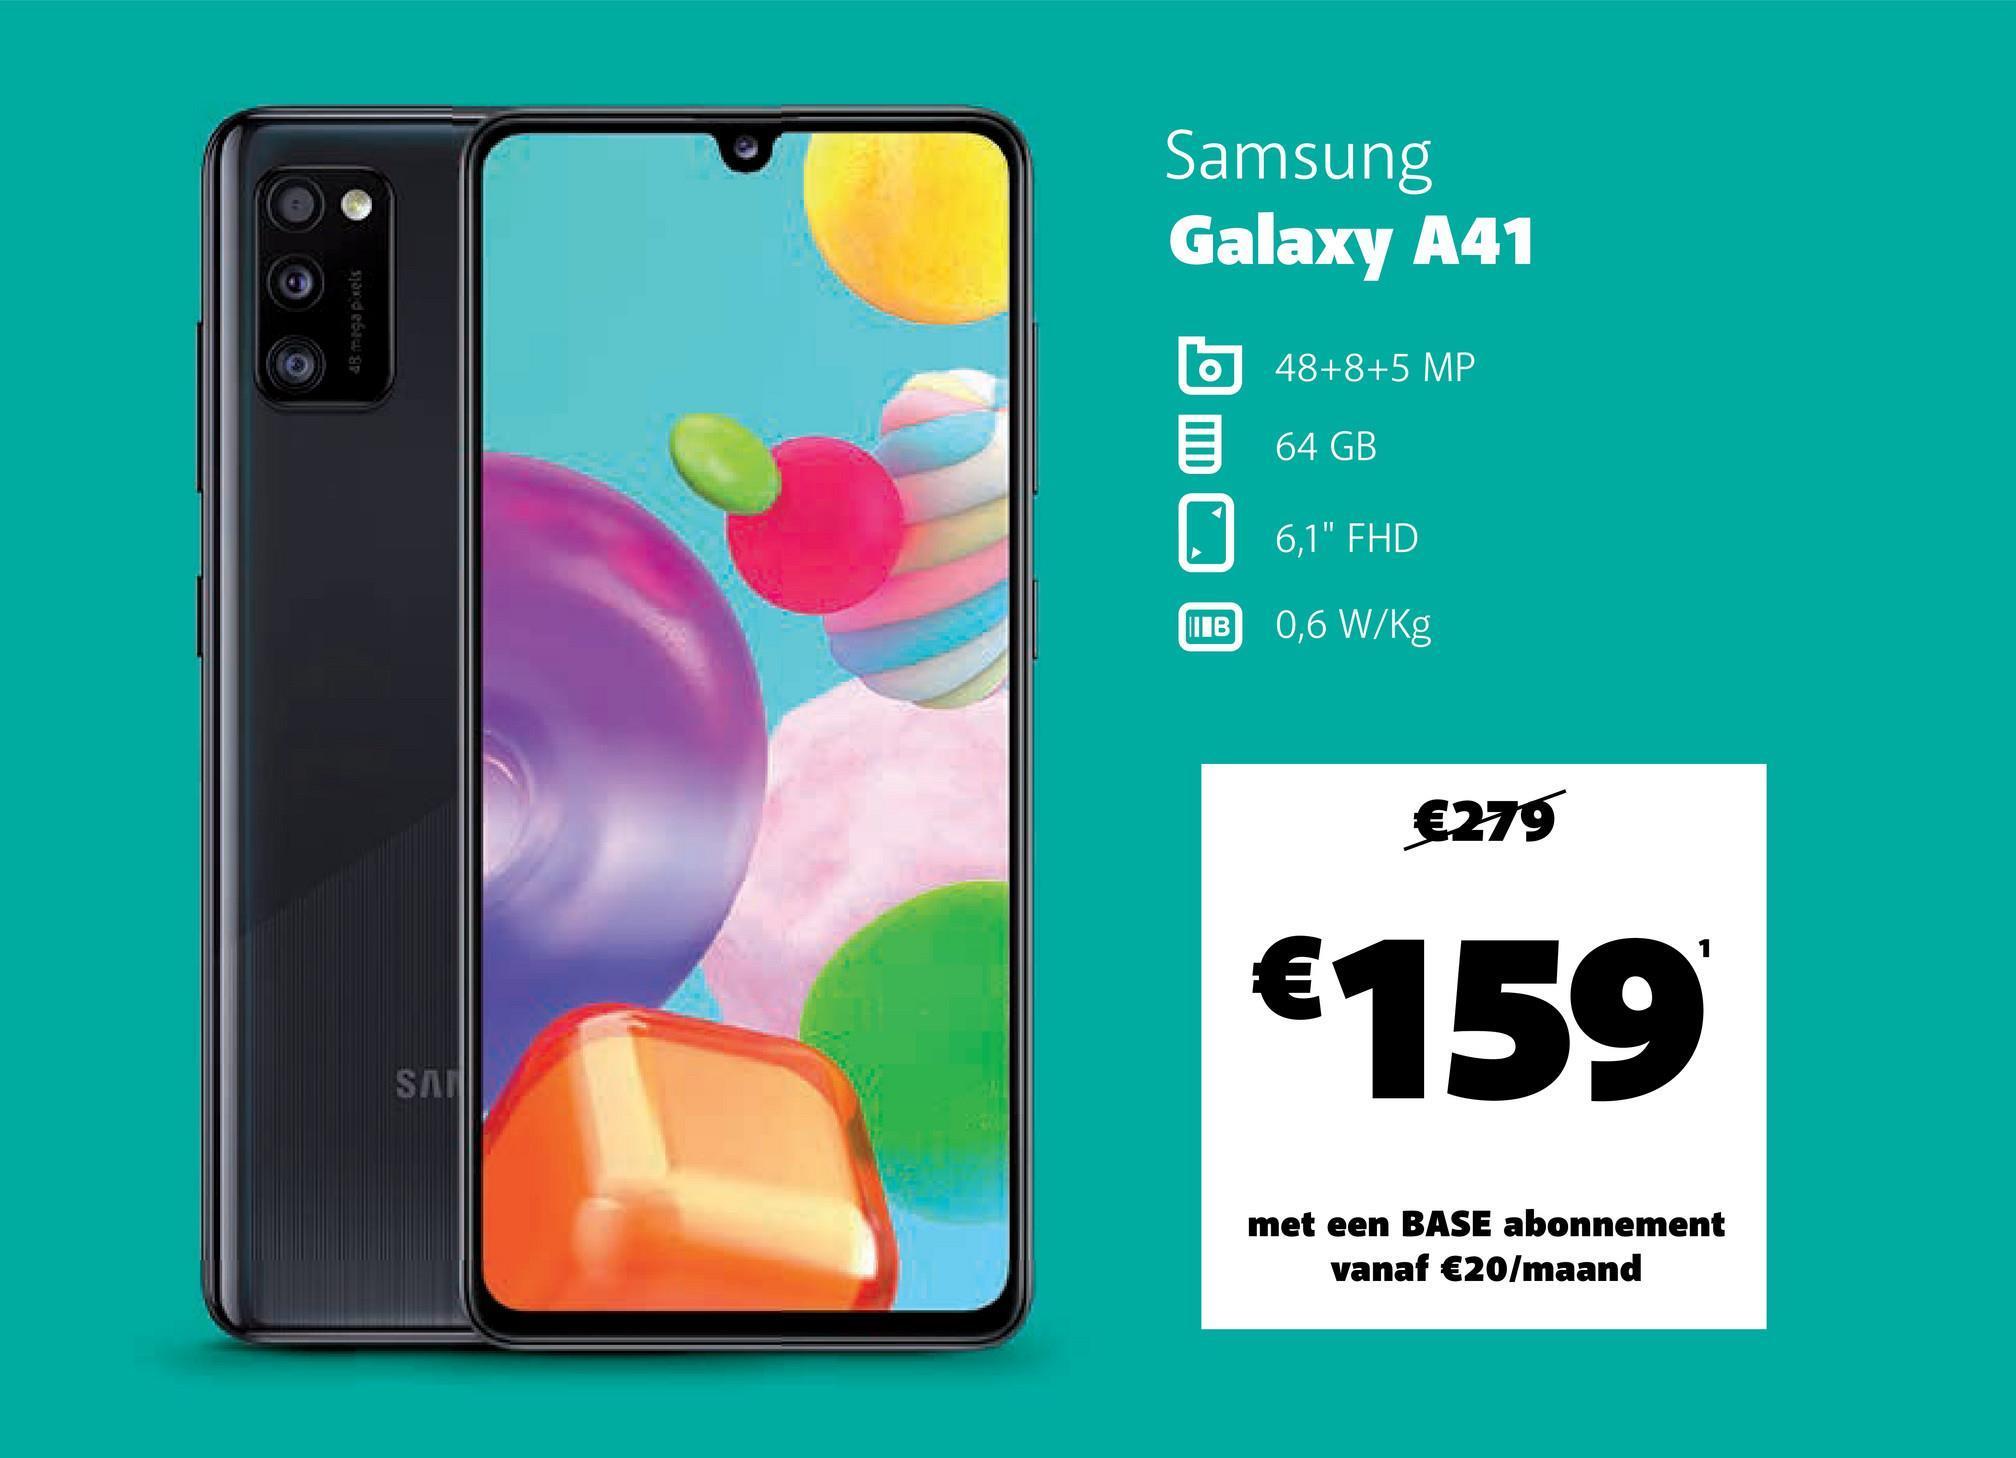 "Samsung Galaxy A41 530 d esius o 48+8+5 MP 64 GB 6,1"" FHD ШТВ 0,6 W/kg €279 1 € €159 SAL met een BASE abonnement vanaf €20/maand"